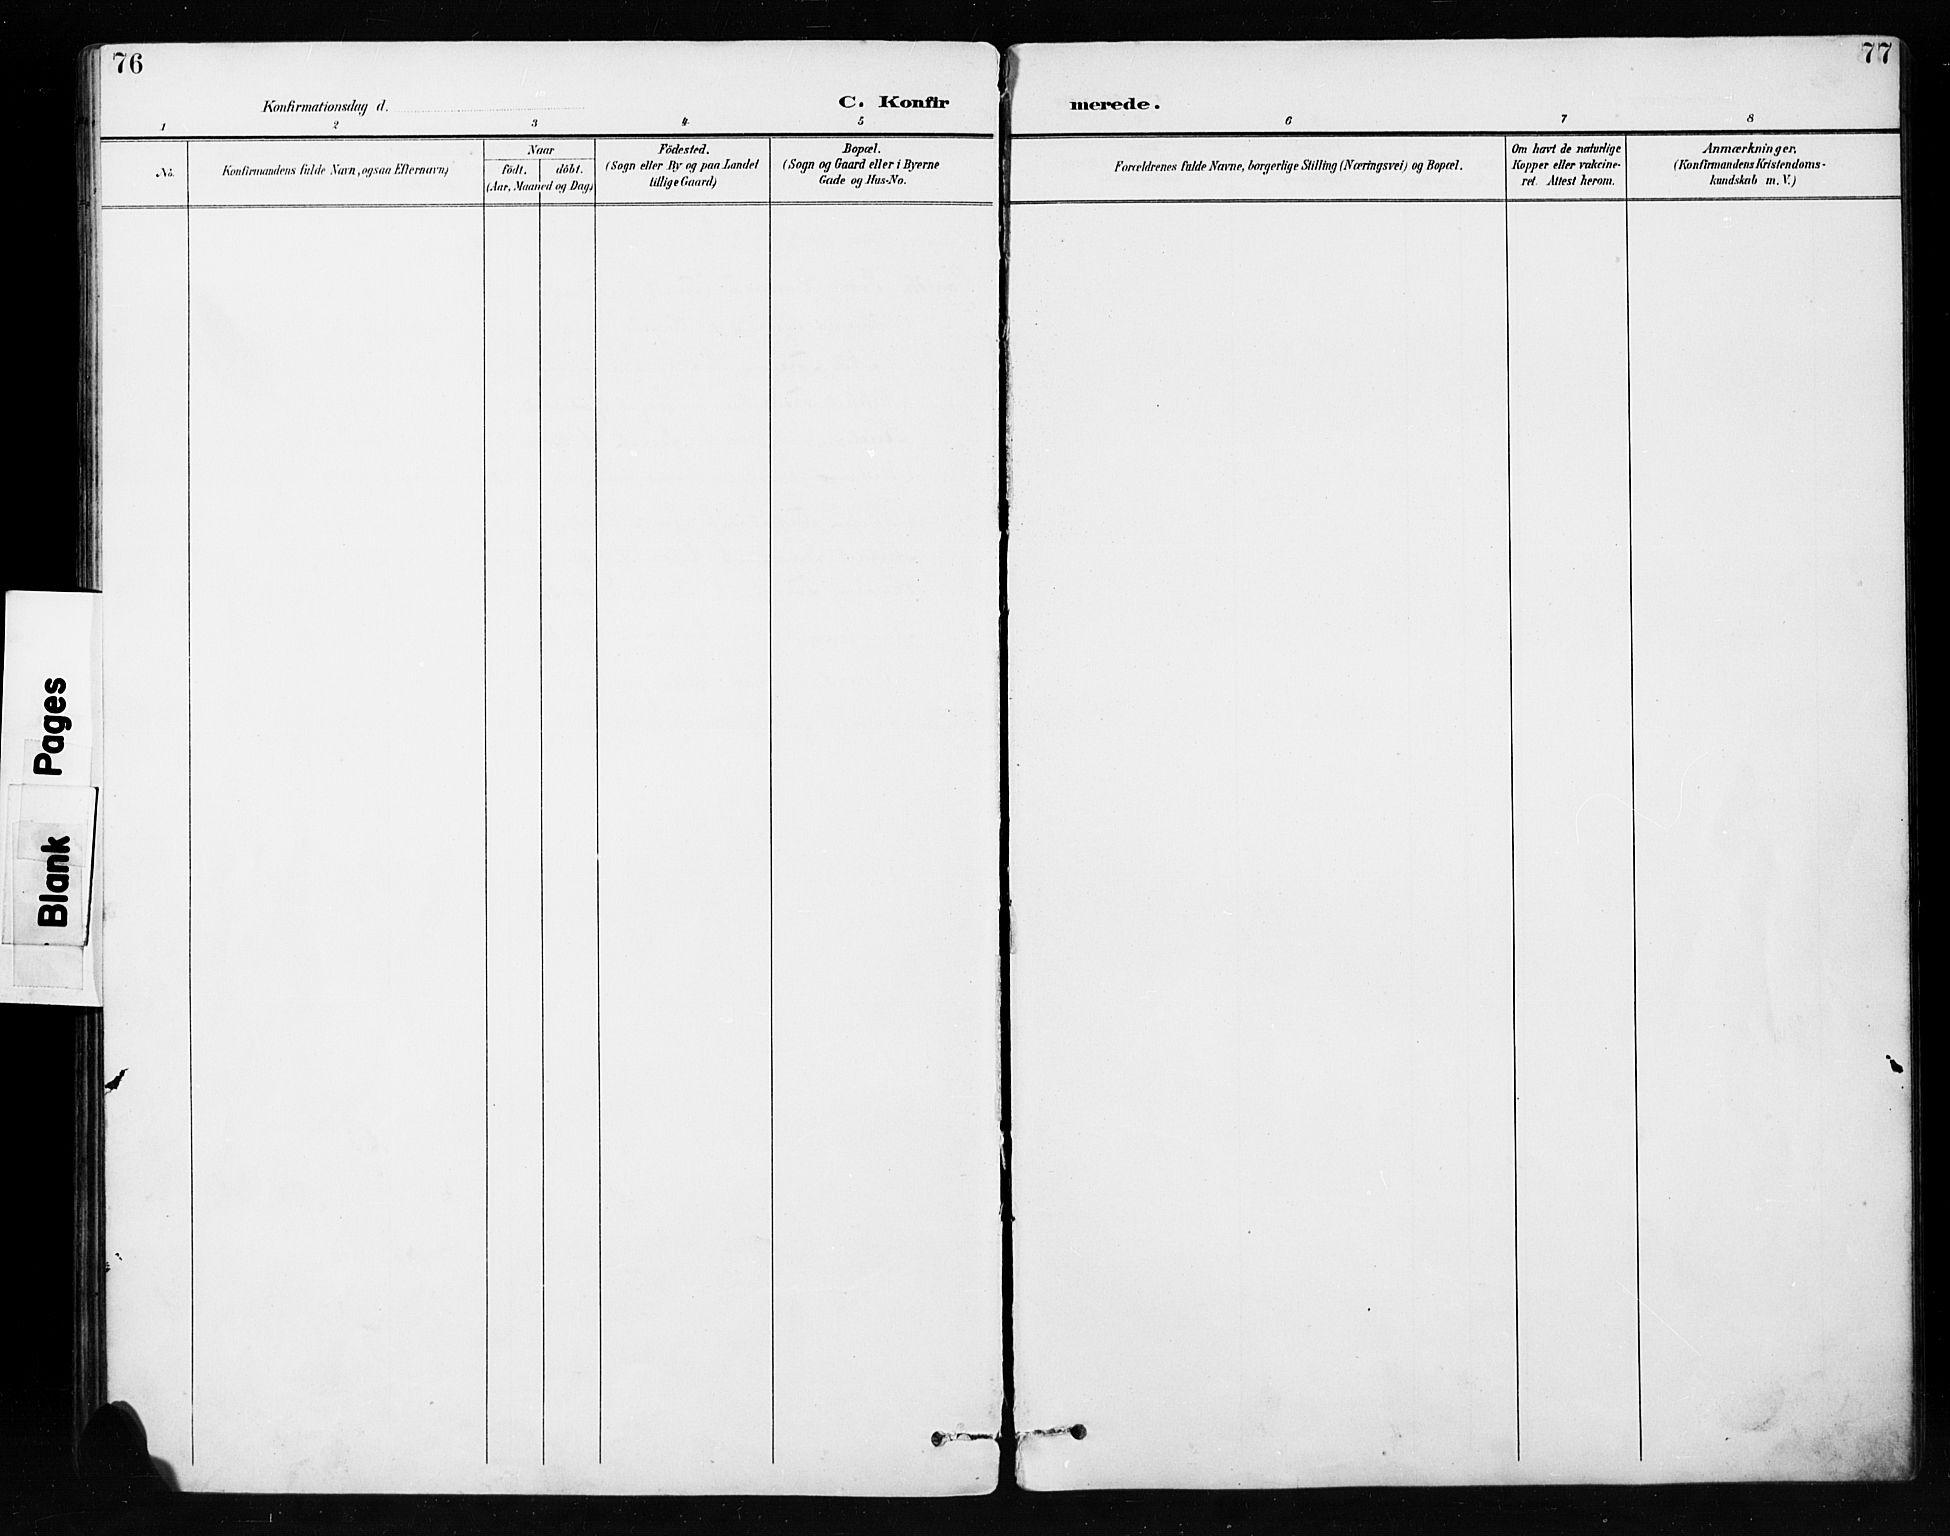 SAH, Etnedal prestekontor, H/Ha/Hab/Habb/L0001: Klokkerbok nr. II 1, 1894-1911, s. 76-77